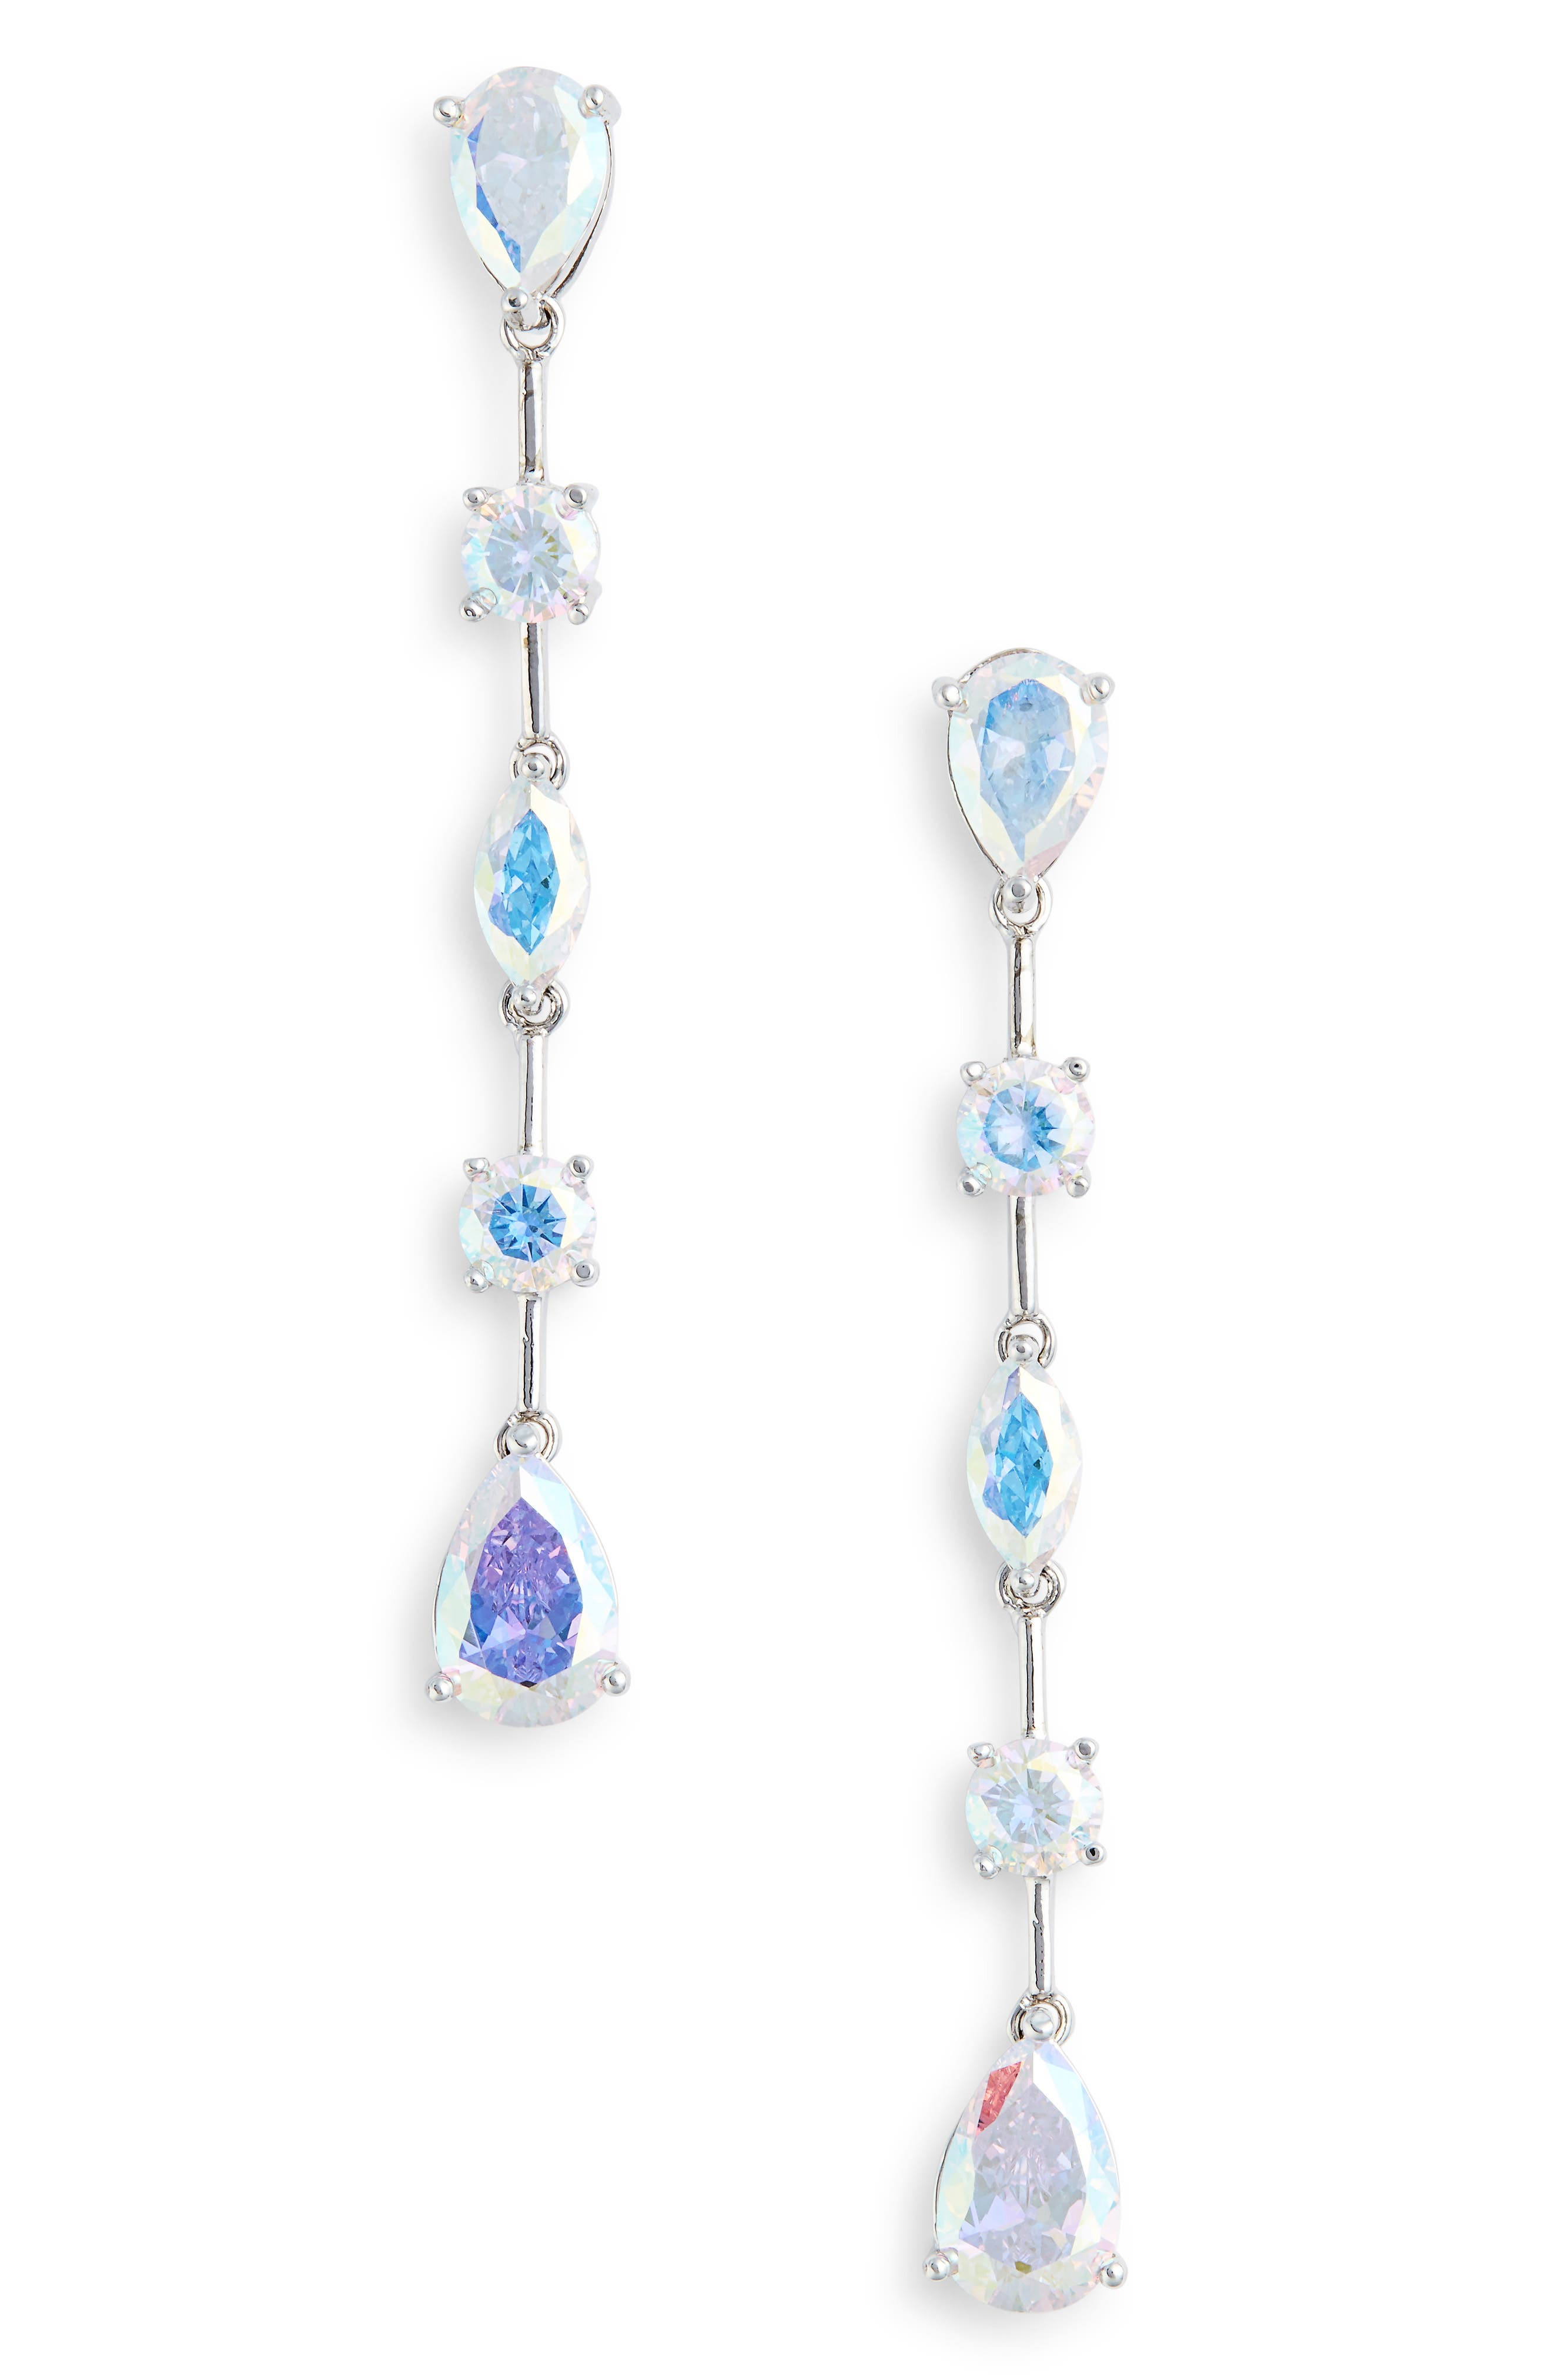 Cubic Zirconia Linear Drop Earrings,                             Main thumbnail 1, color,                             Silver/ Light Crystal